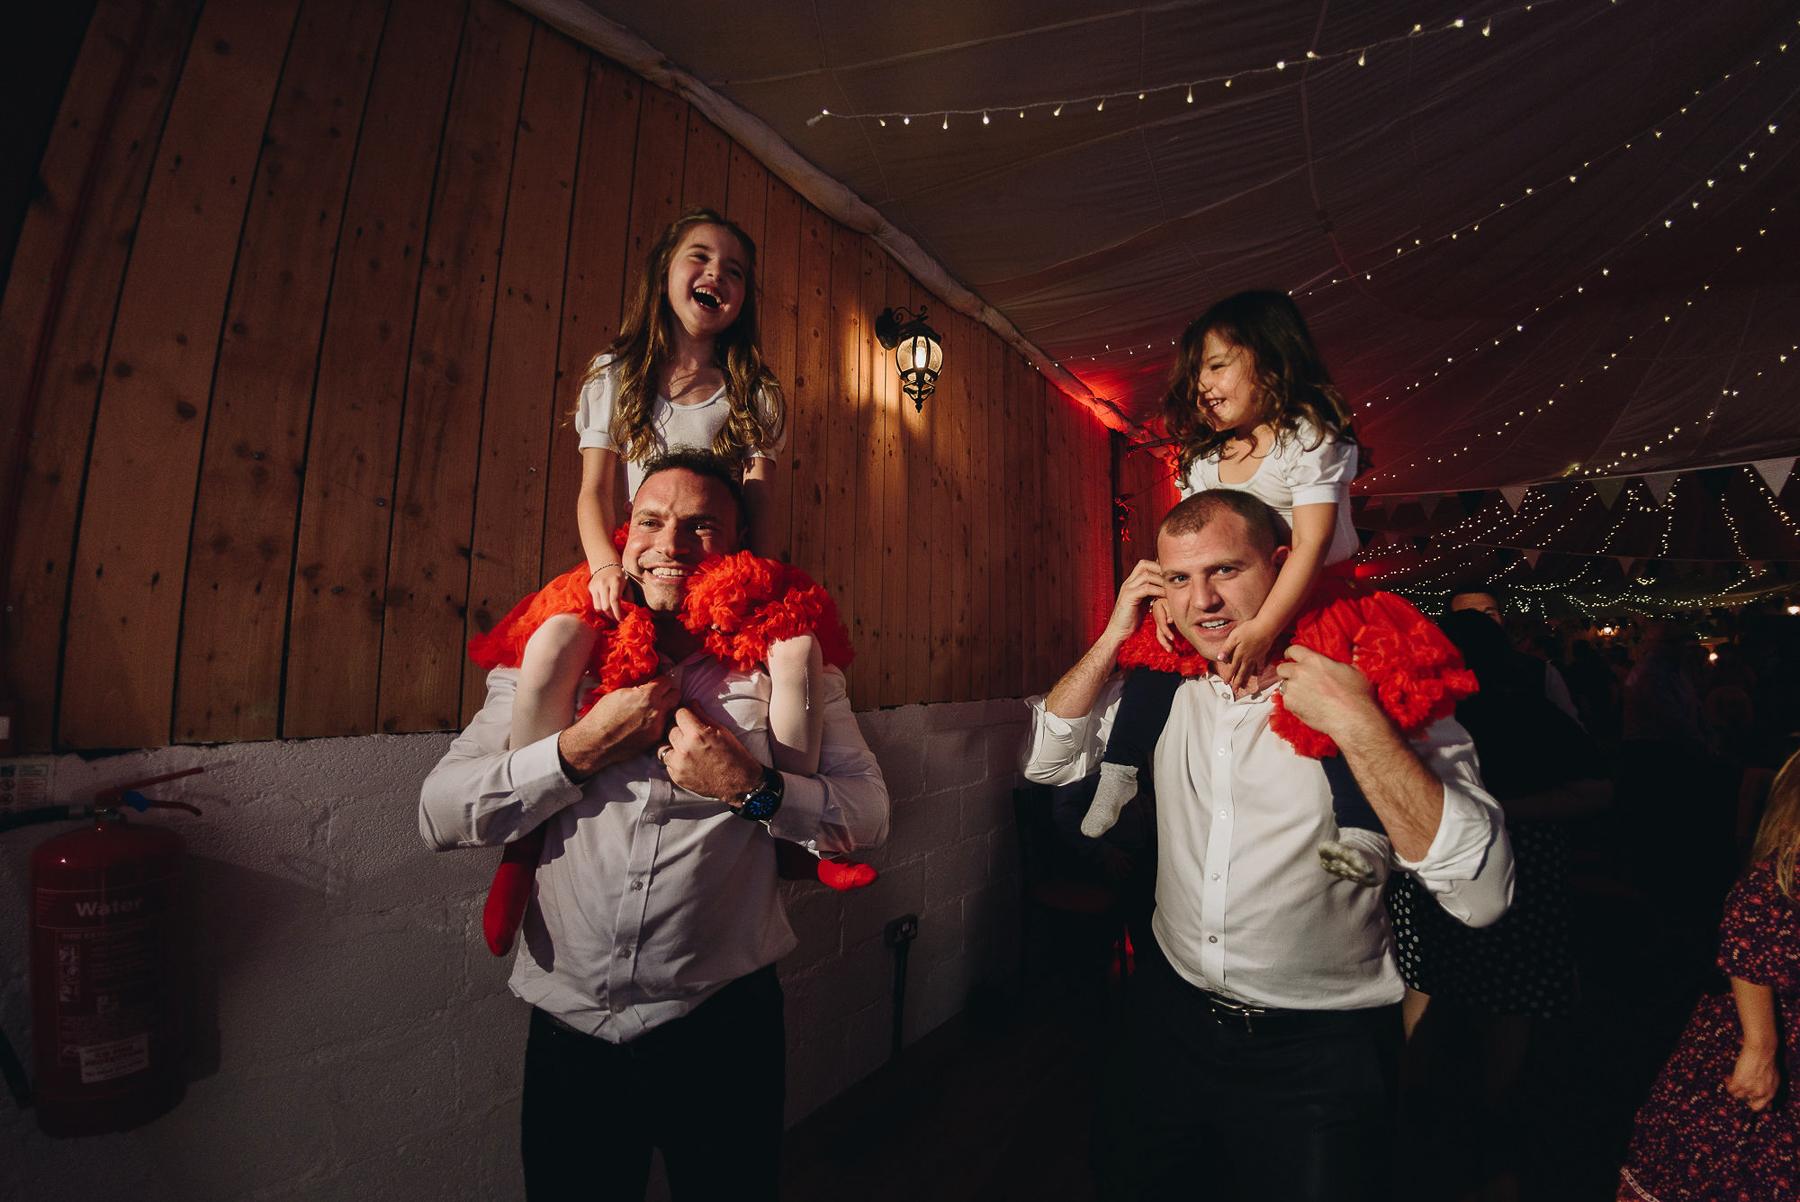 Wellbeing_Farm_Wedding_Photography_The_Pin-Up_Bride_Lara_Shaun-159.jpg